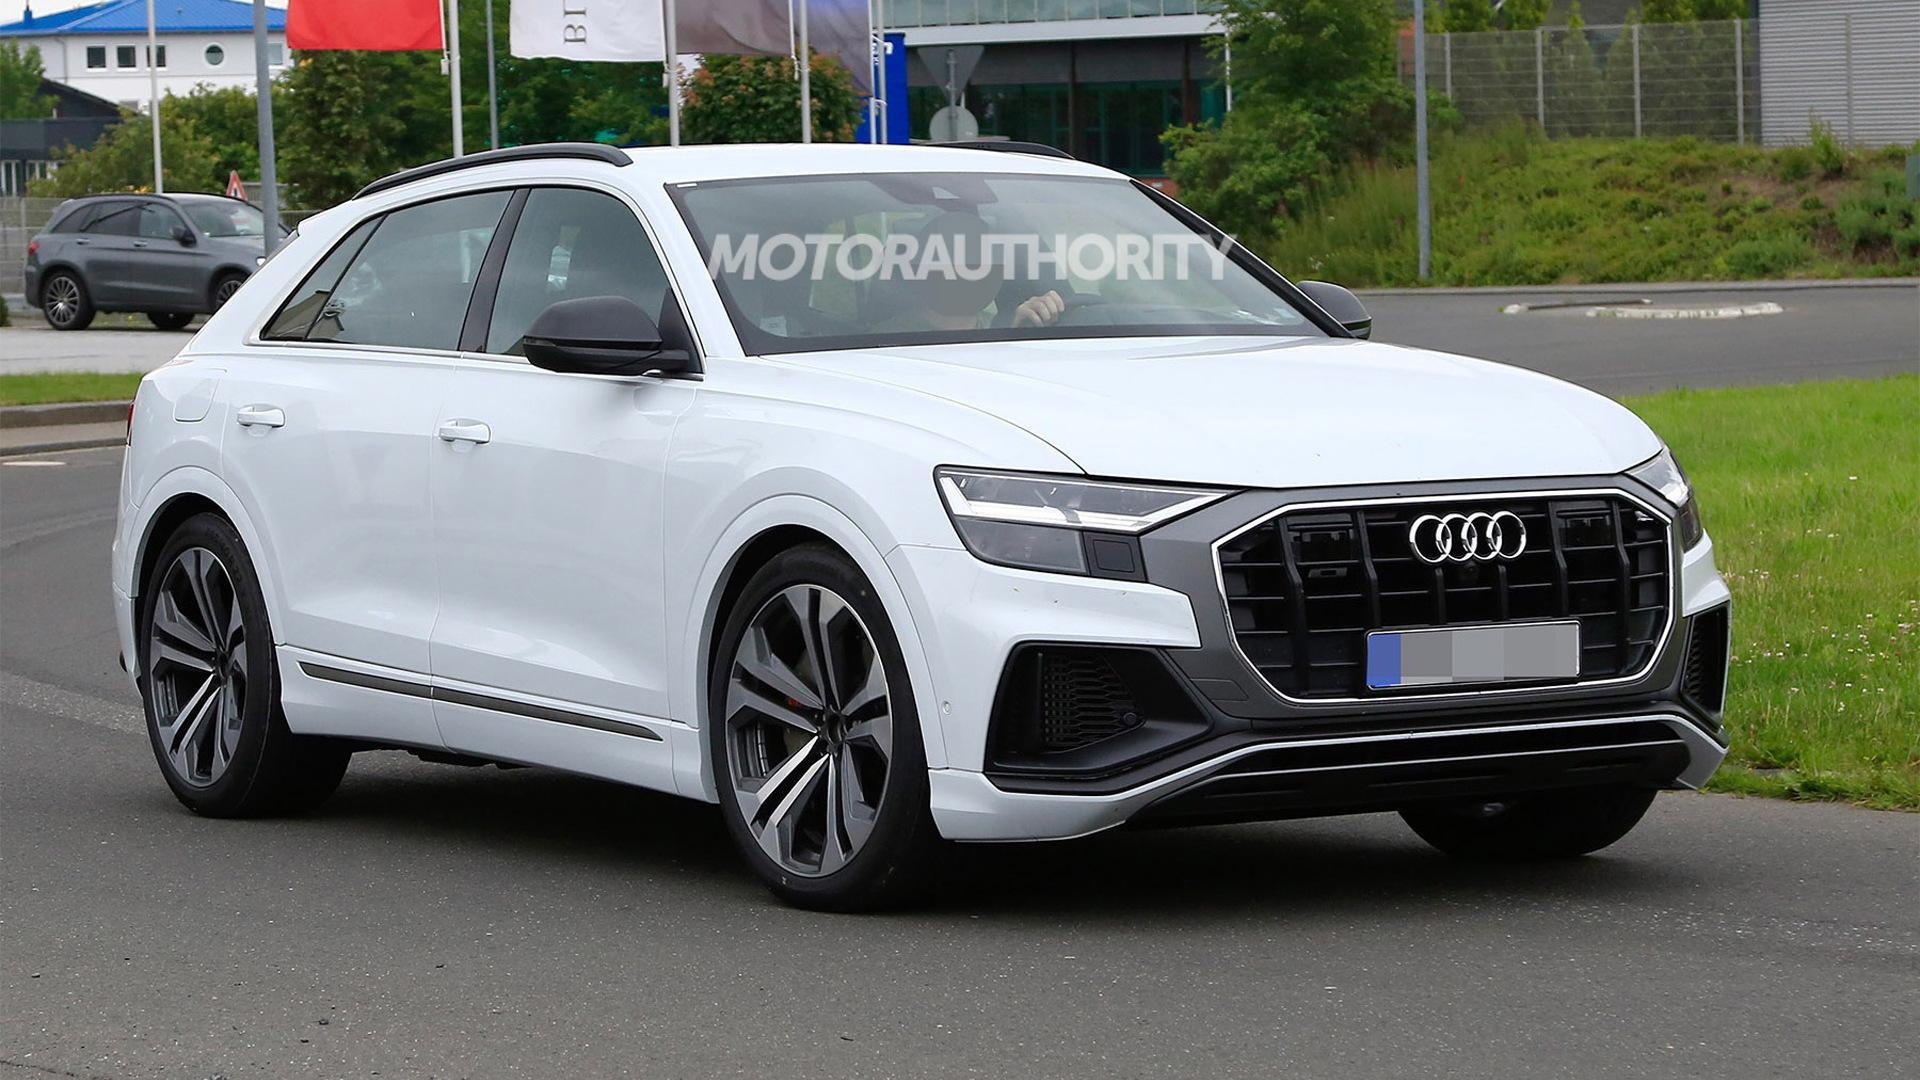 2019 Audi SQ8 spy shots - Image via S. Baldauf/SB-Medien